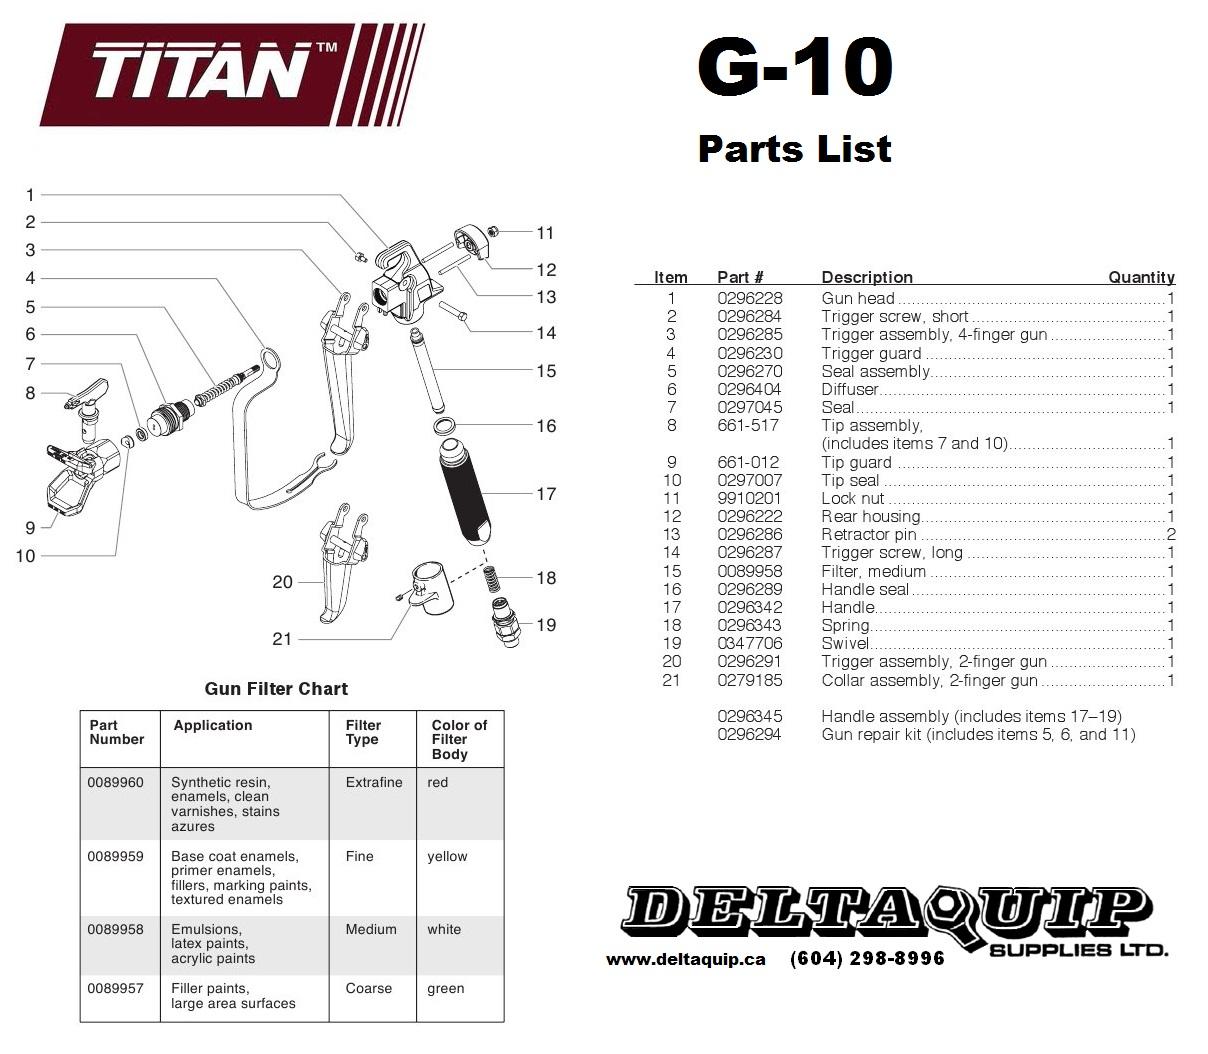 Deltaquip Supplies Ltd